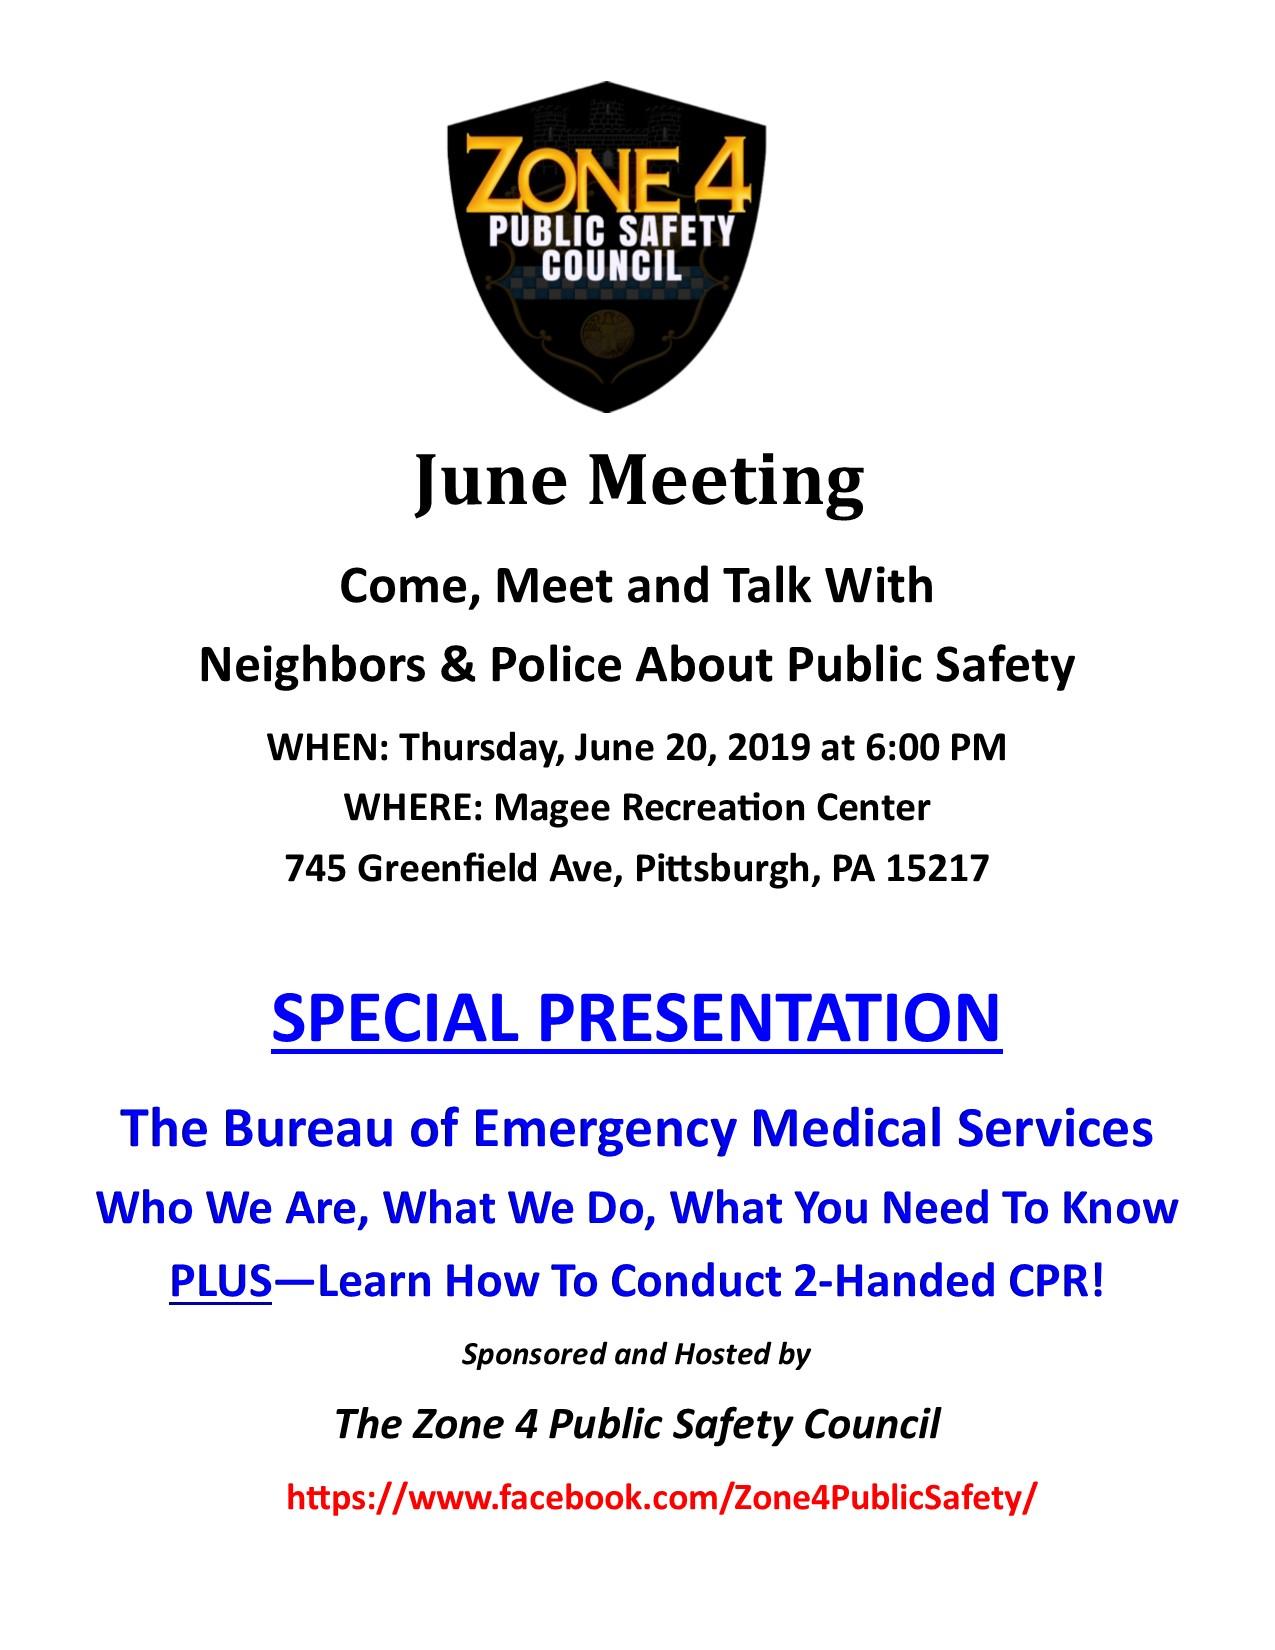 Zone 4 June 20, 2019 Meeting Flyer.jpg